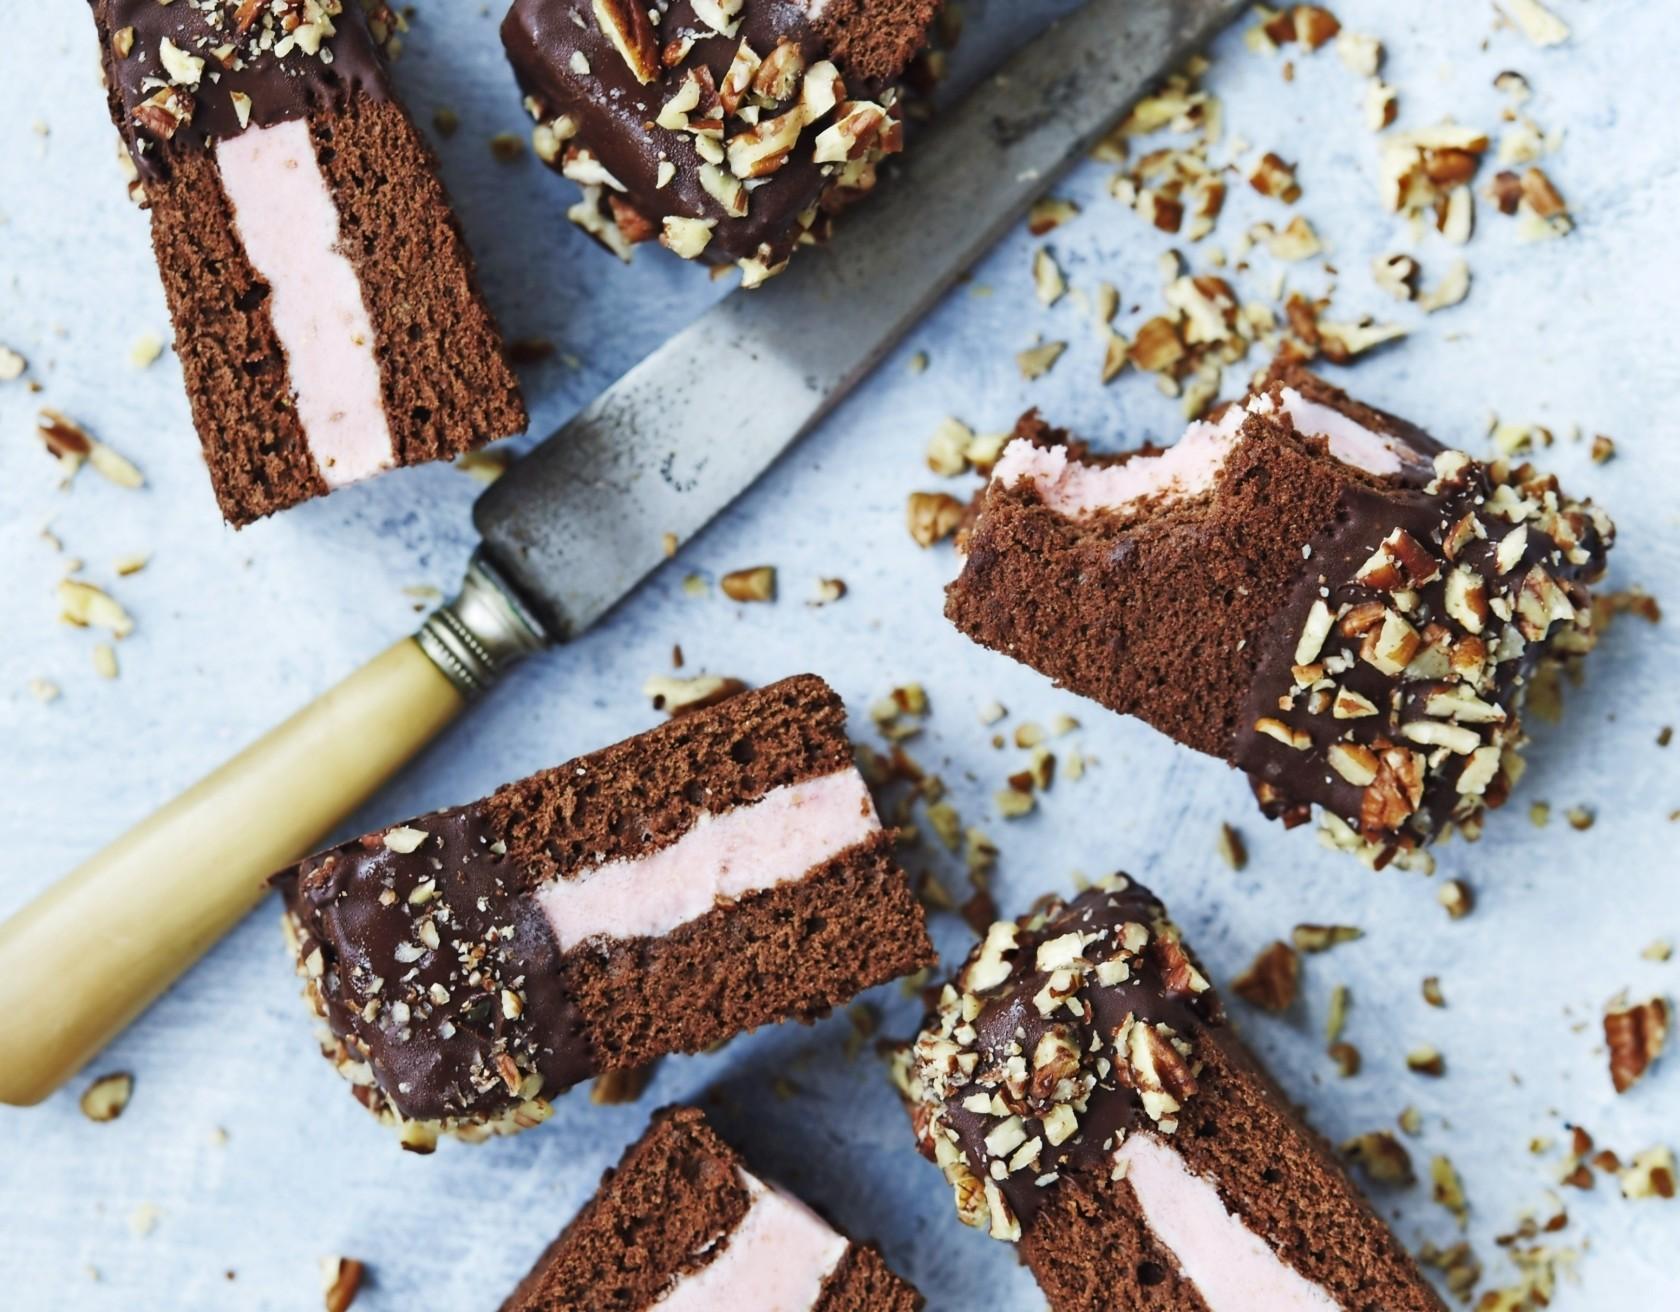 De lækreste issandwich med jordbæris og chokolade!